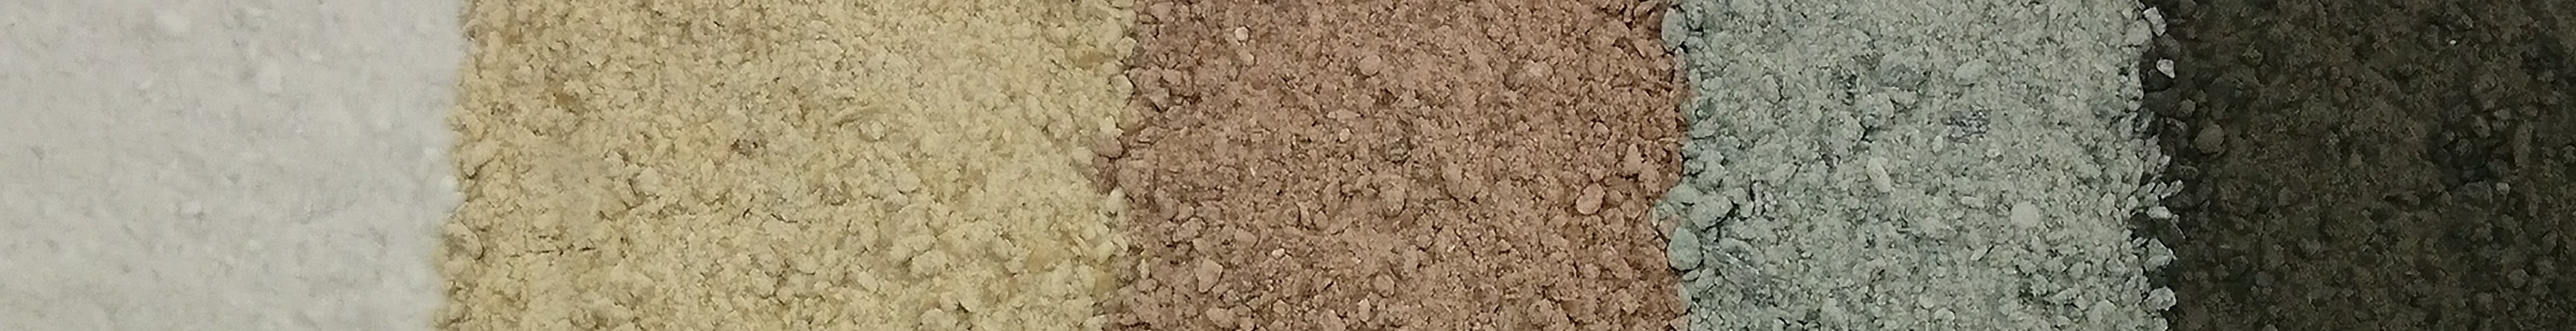 Marmorpulver